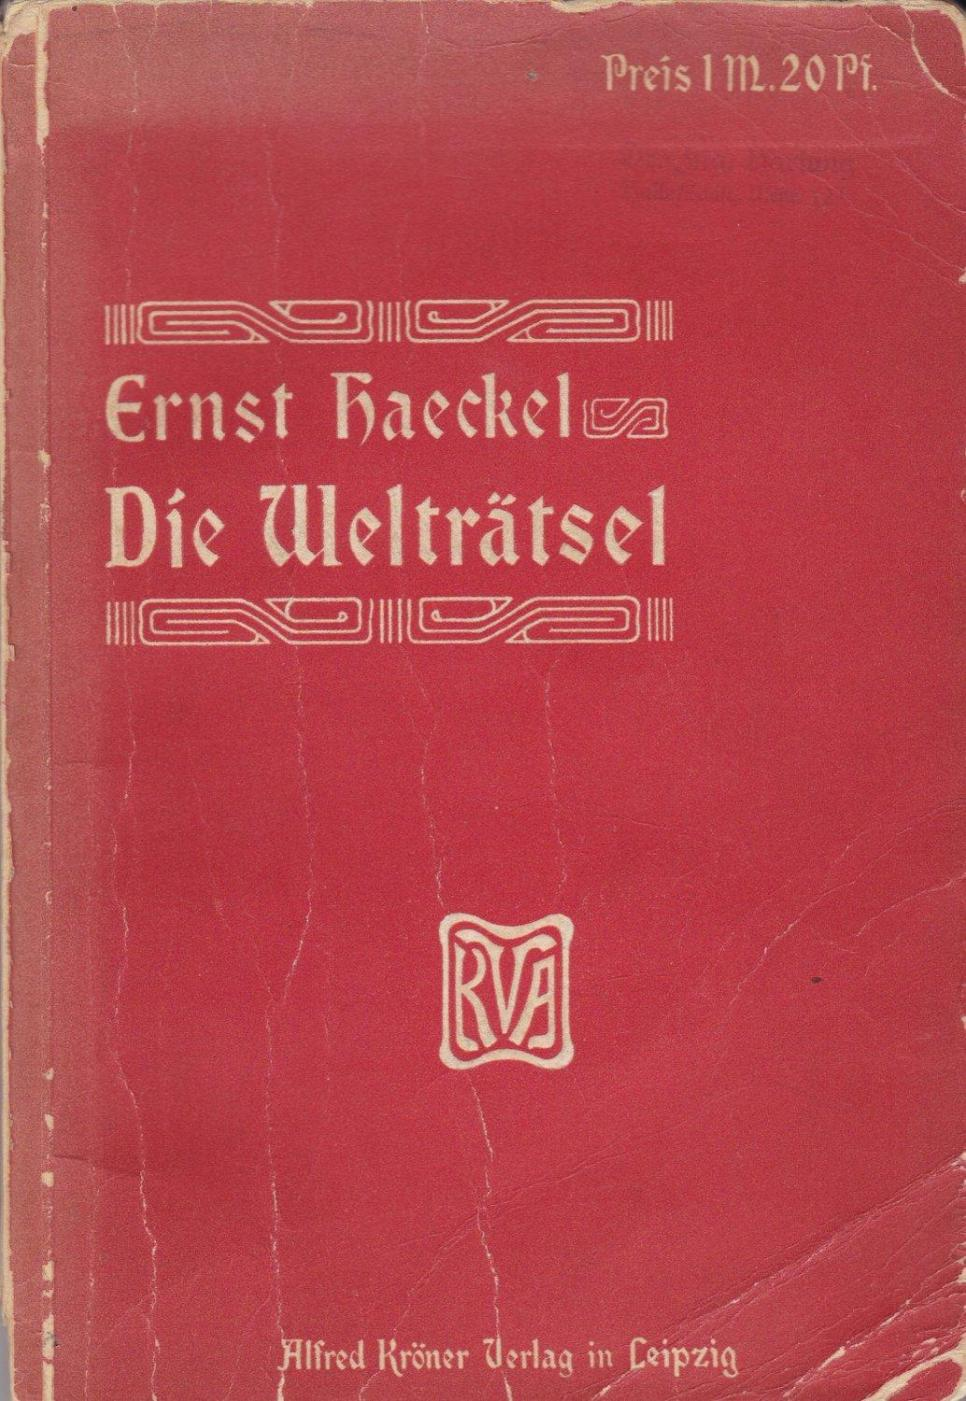 1697448344_Ernst-HaeckelDie-Weltrtsel.thumb.jpg.3647beab24df08e9b6d30ef292f321d9.jpg